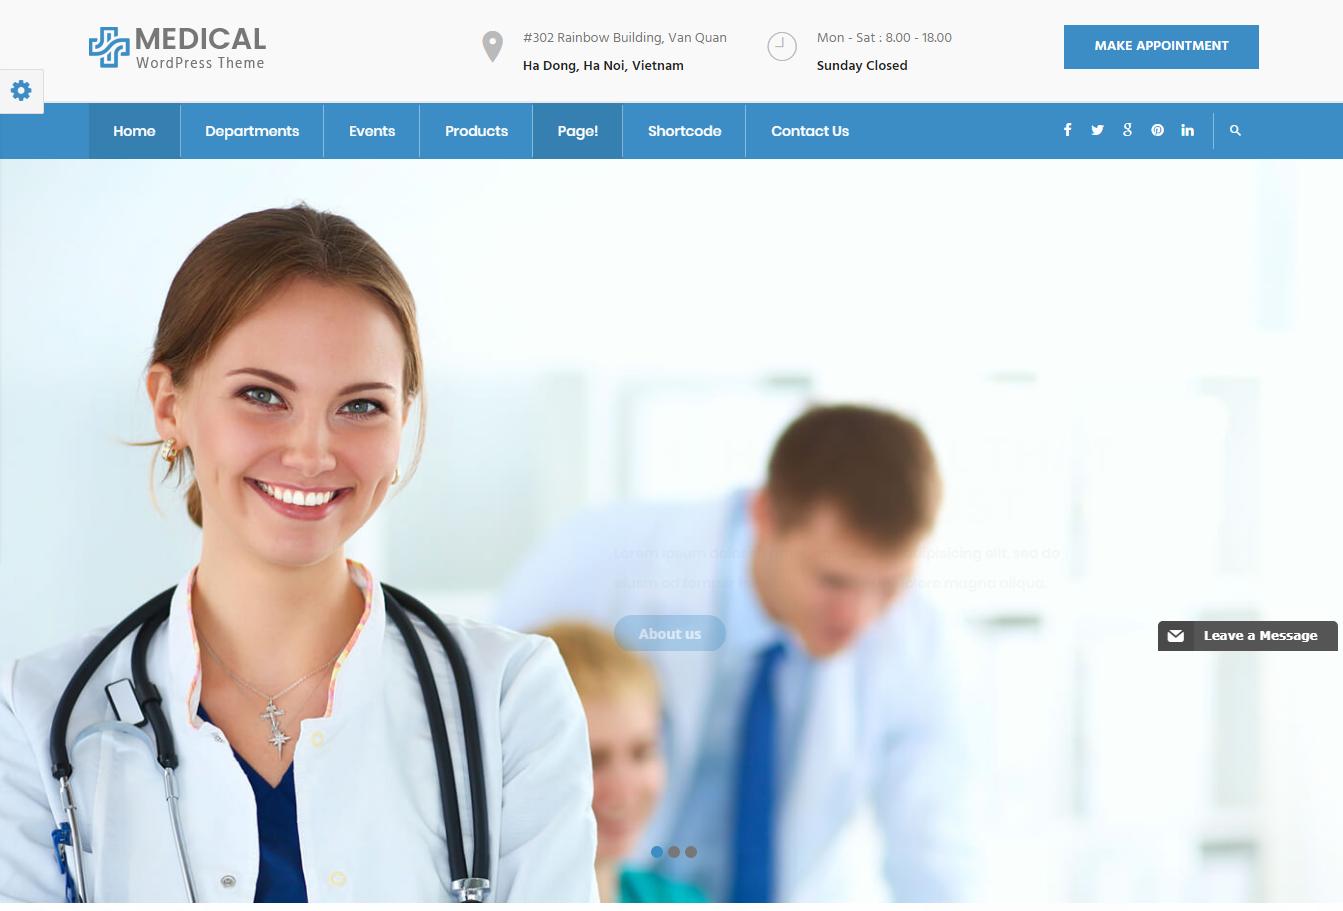 inMedical - Multipurpose Medical WordPress Theme